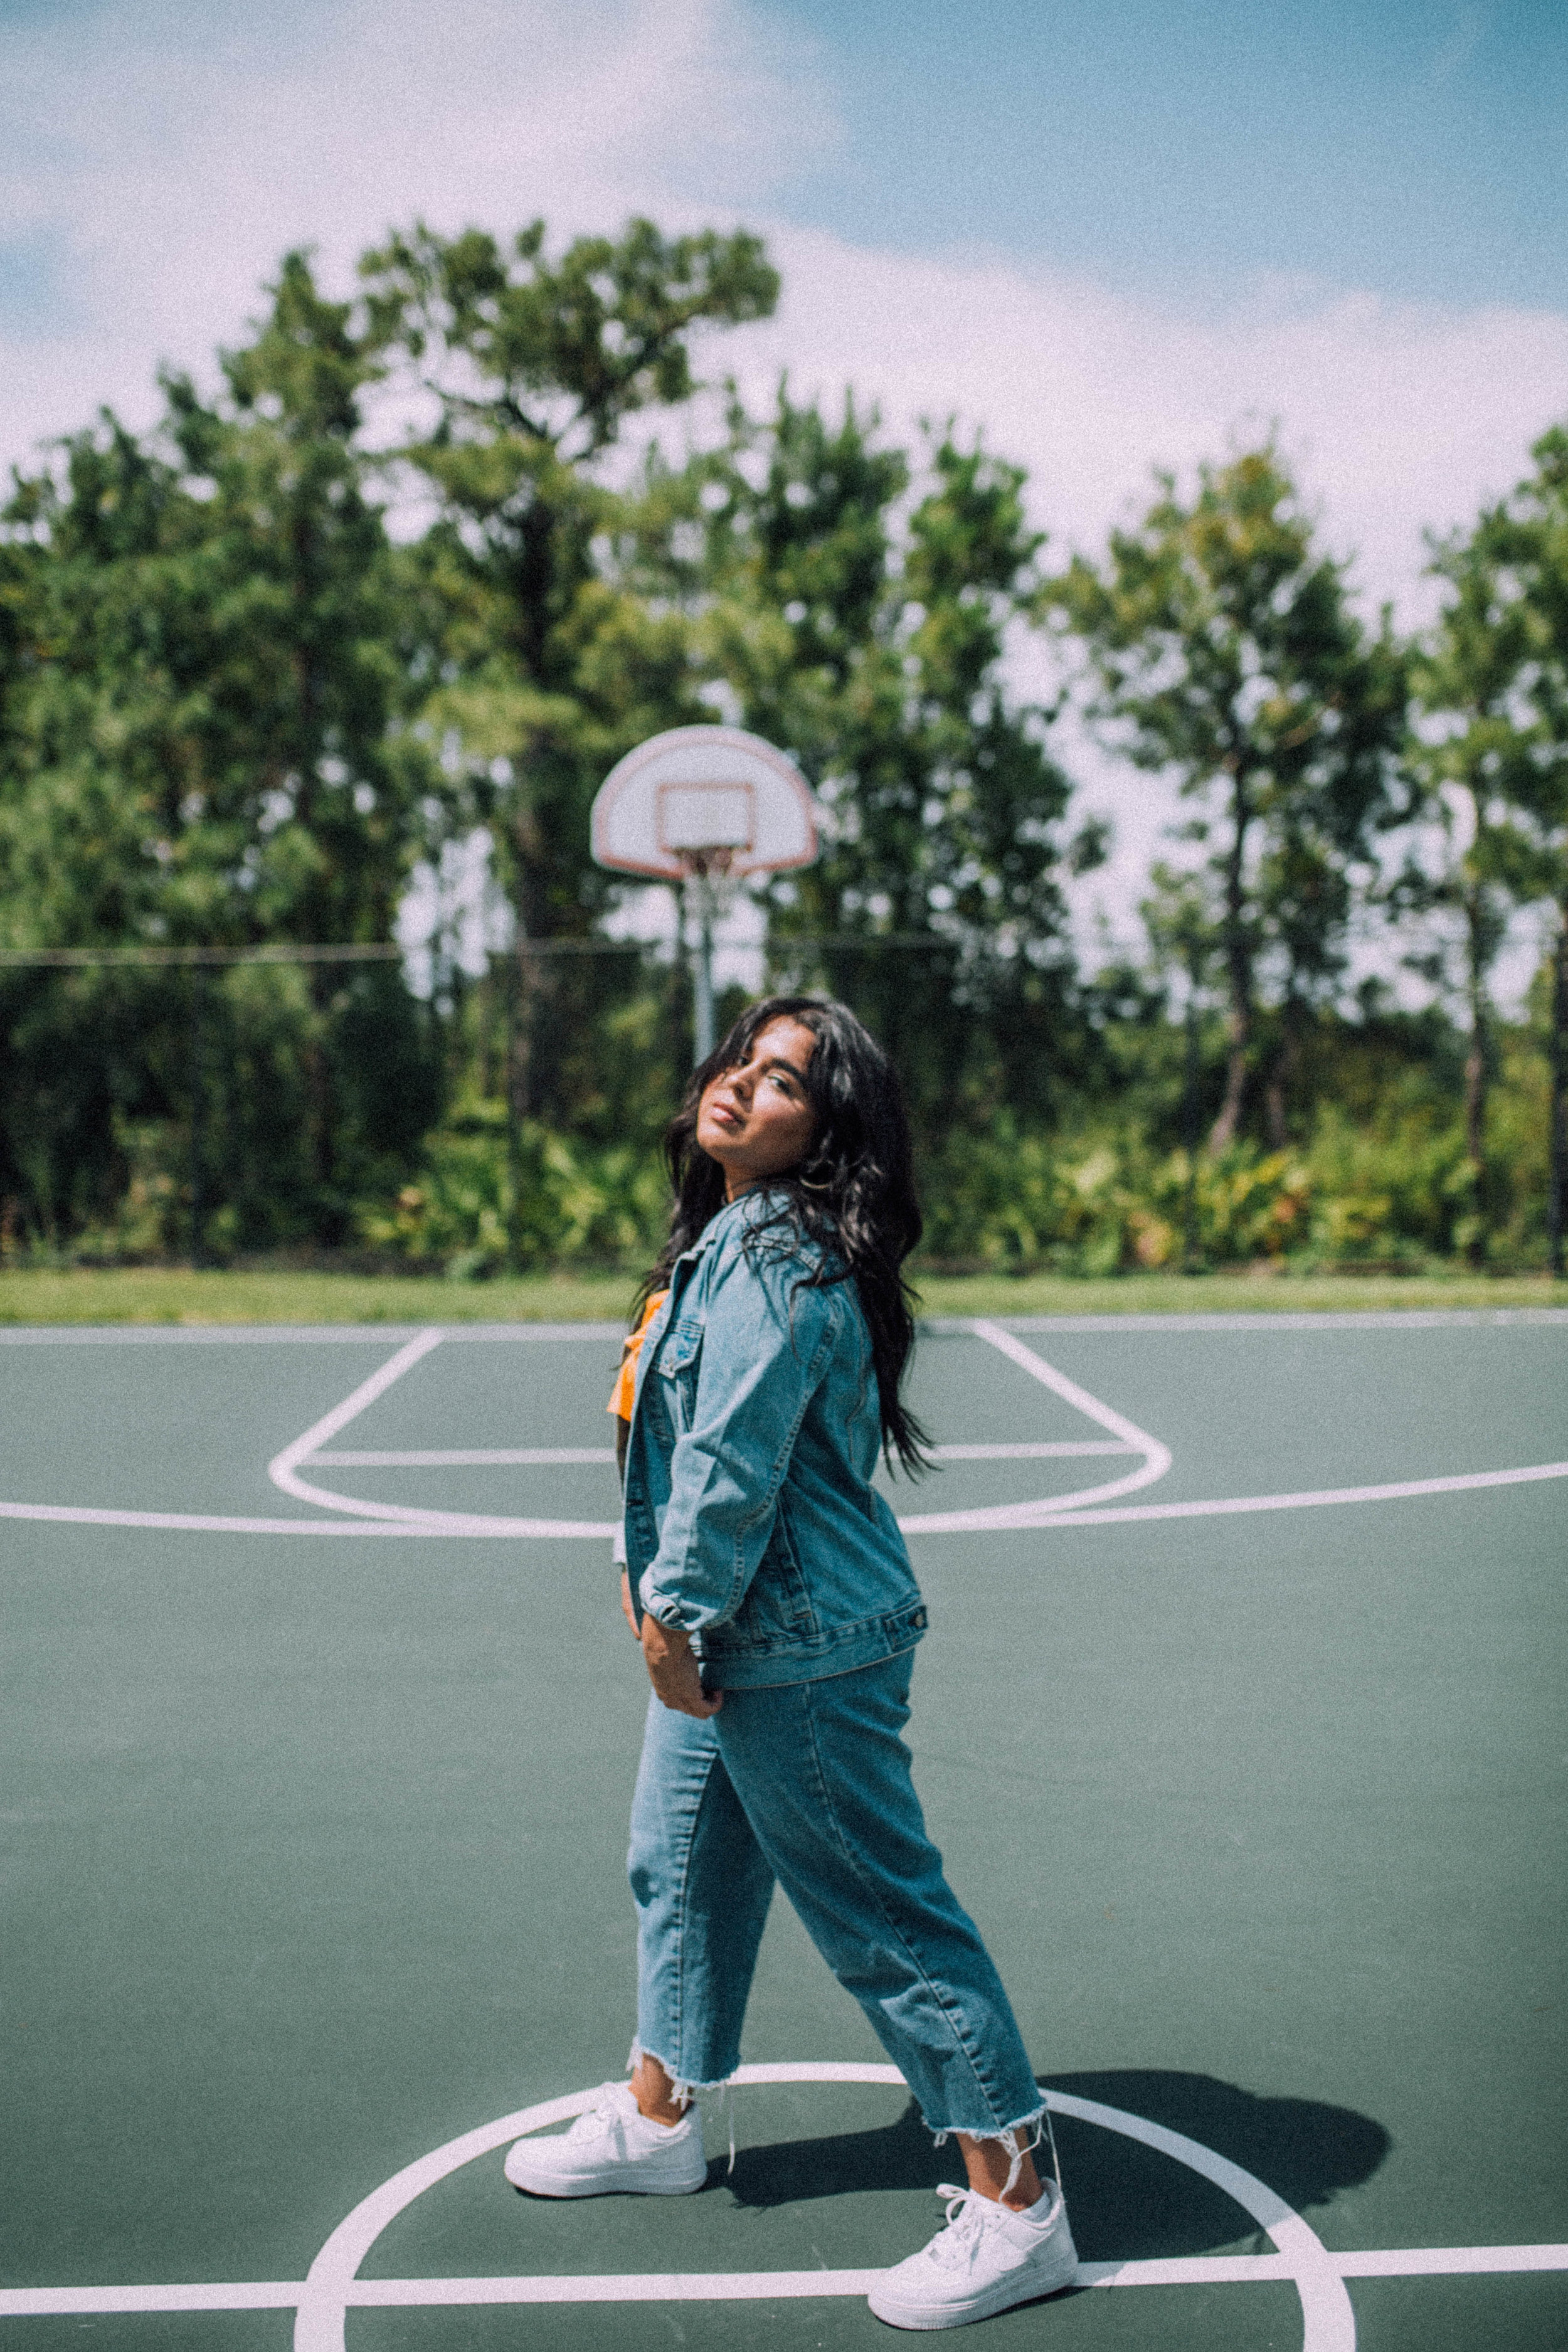 basketball court-9.jpg